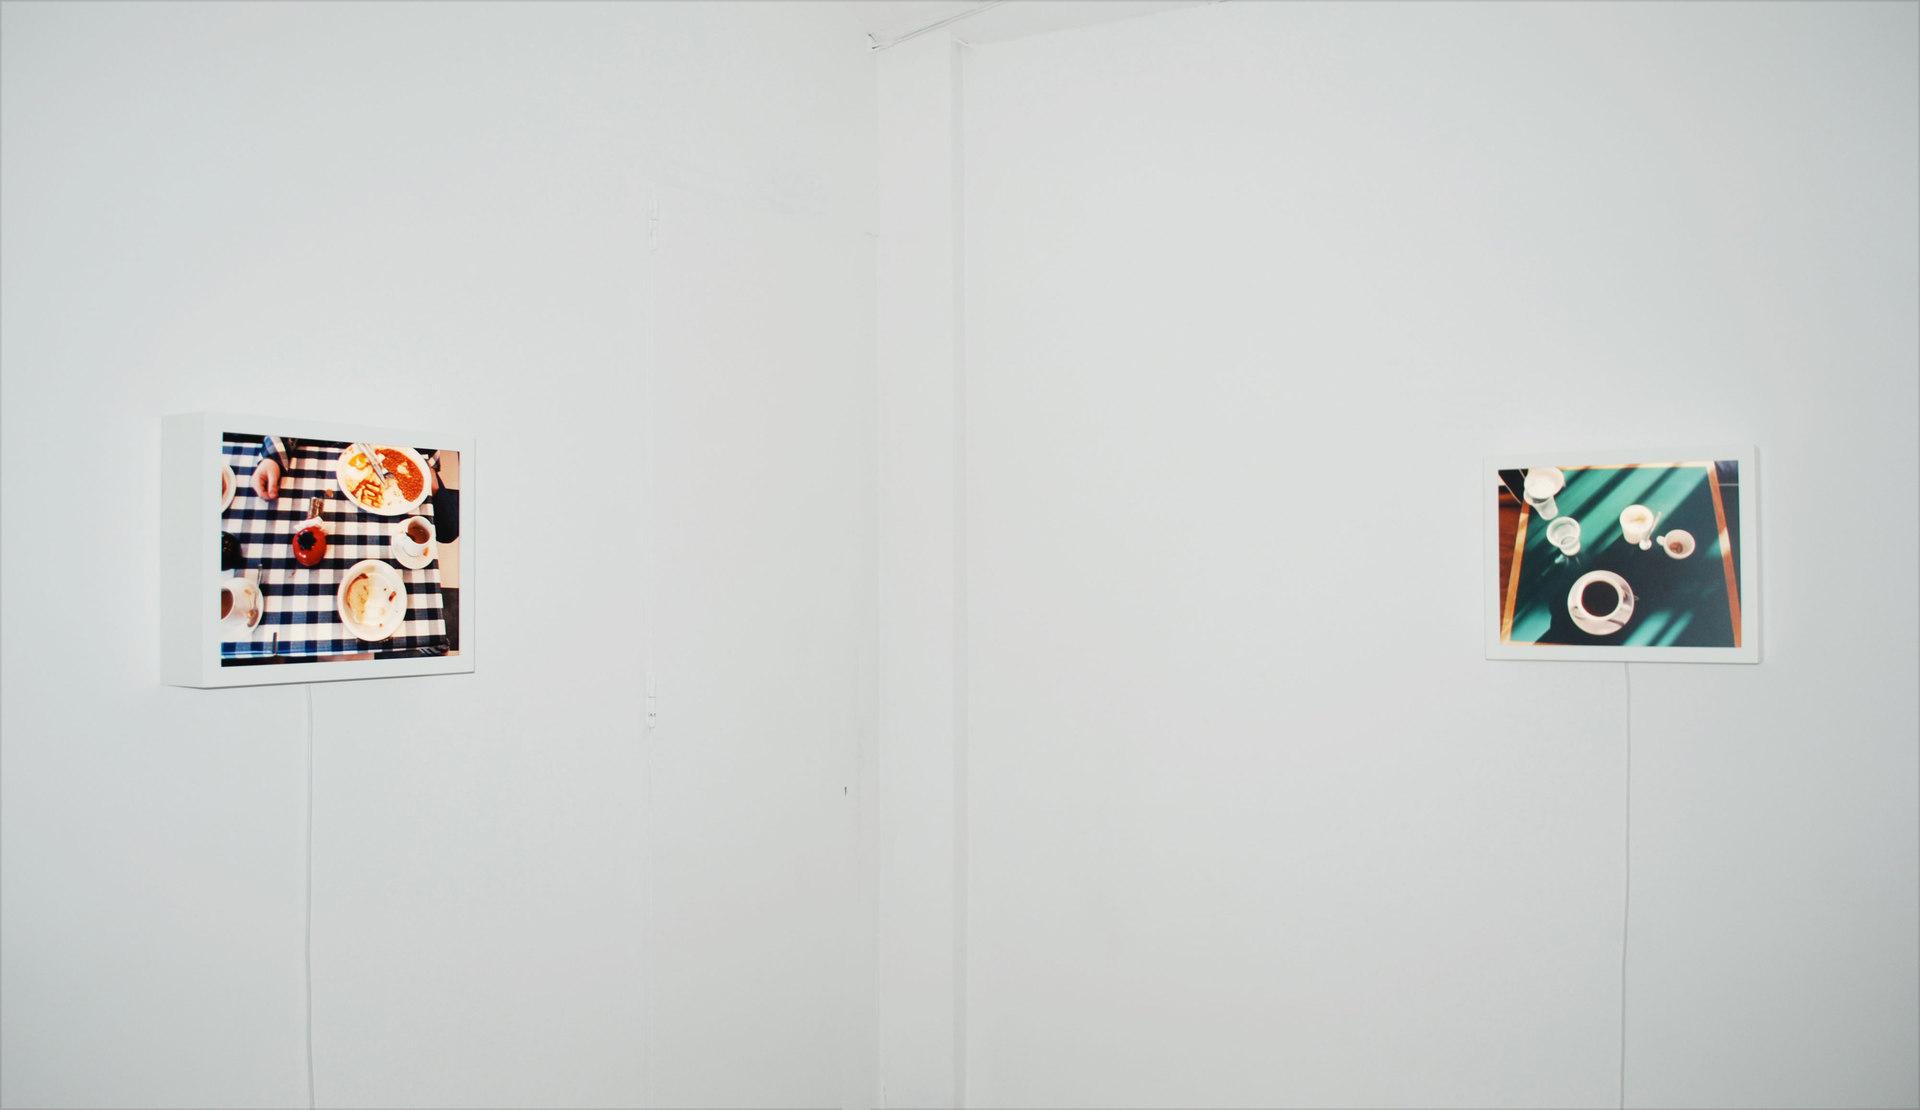 Emma Hart, JAM, 'Car Crash' 2011, Duratrans print, Cell Project Space